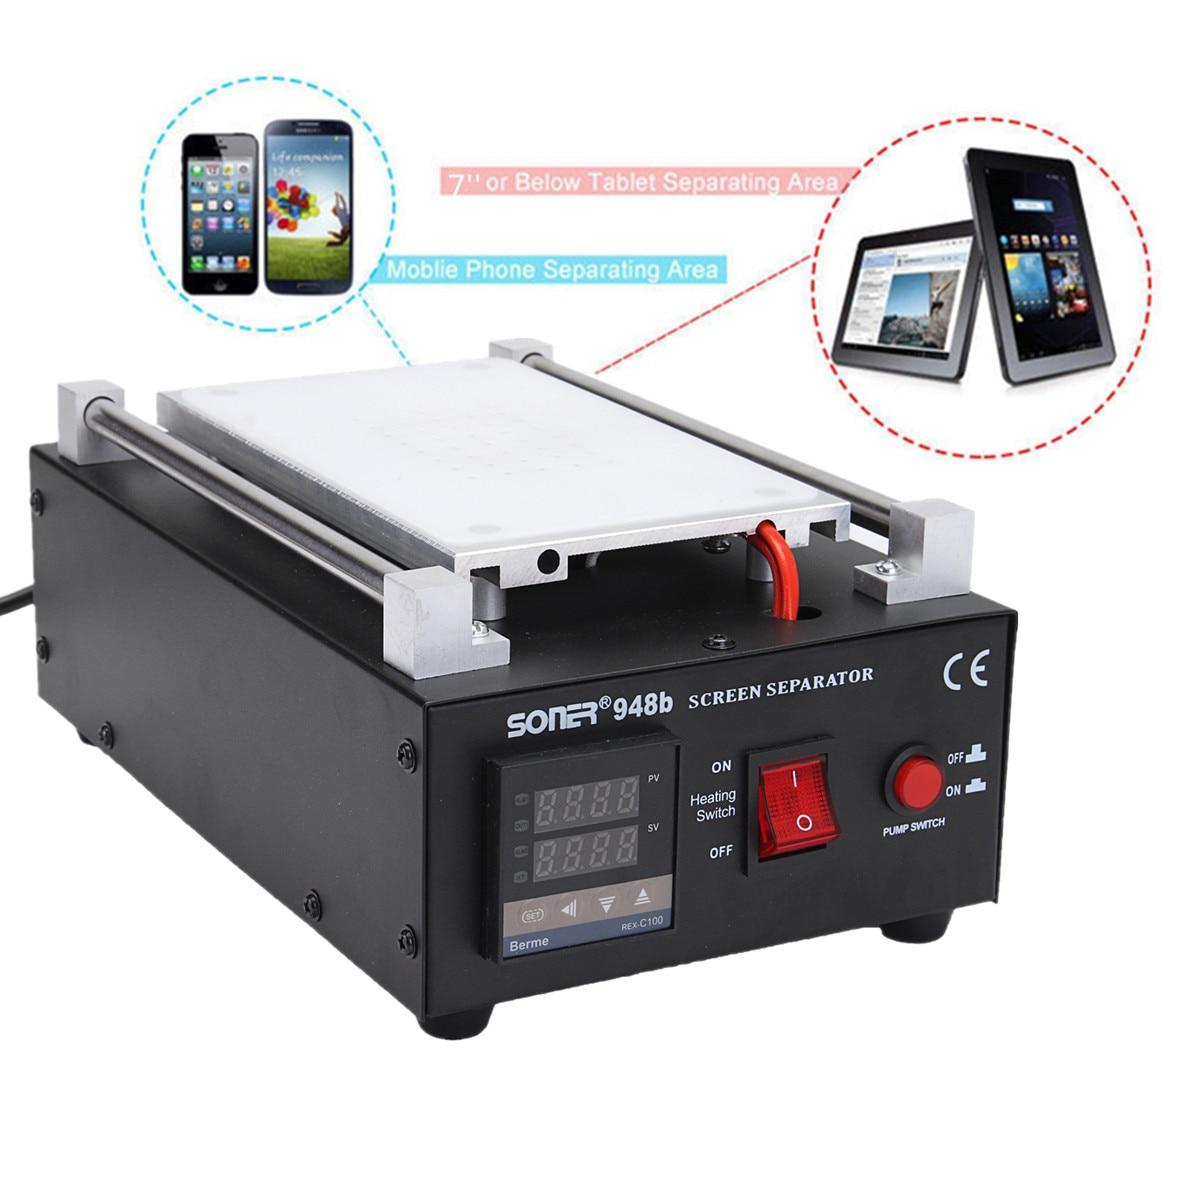 все цены на LED Display 7 Built-in Vacuum Pump Mobile Phone LCD Glass Screen Separator Repair Machine Different Cover Plate Auto Heating онлайн